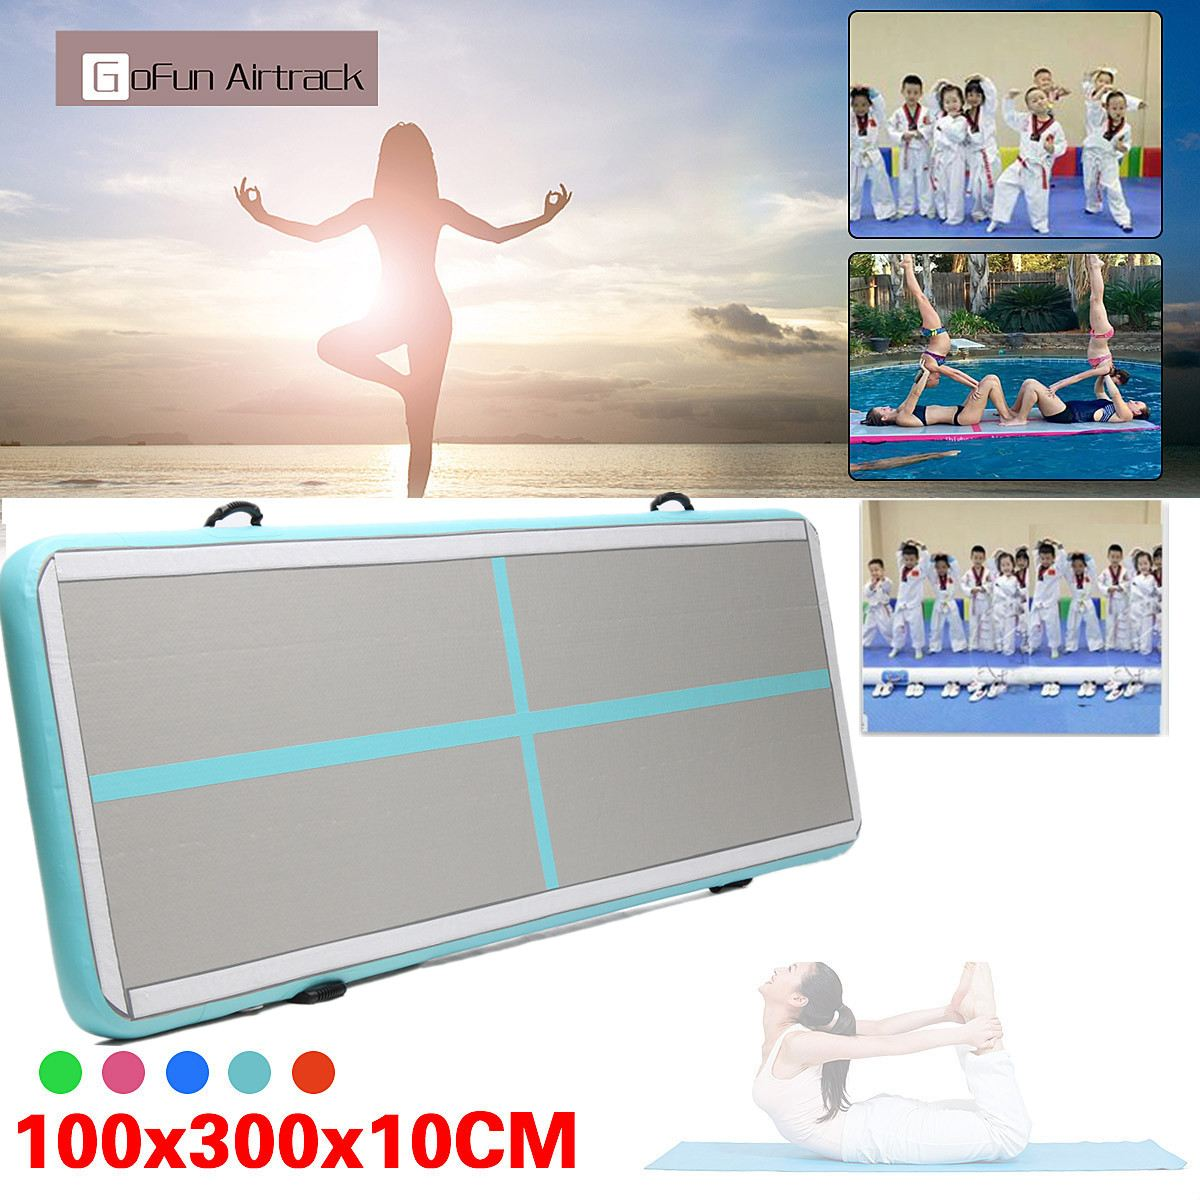 Newest 100x300x10cm Inflatable Tumble Track Trampoline Air Track Taekwondo Gymnastics Inflatable Air Mat все цены